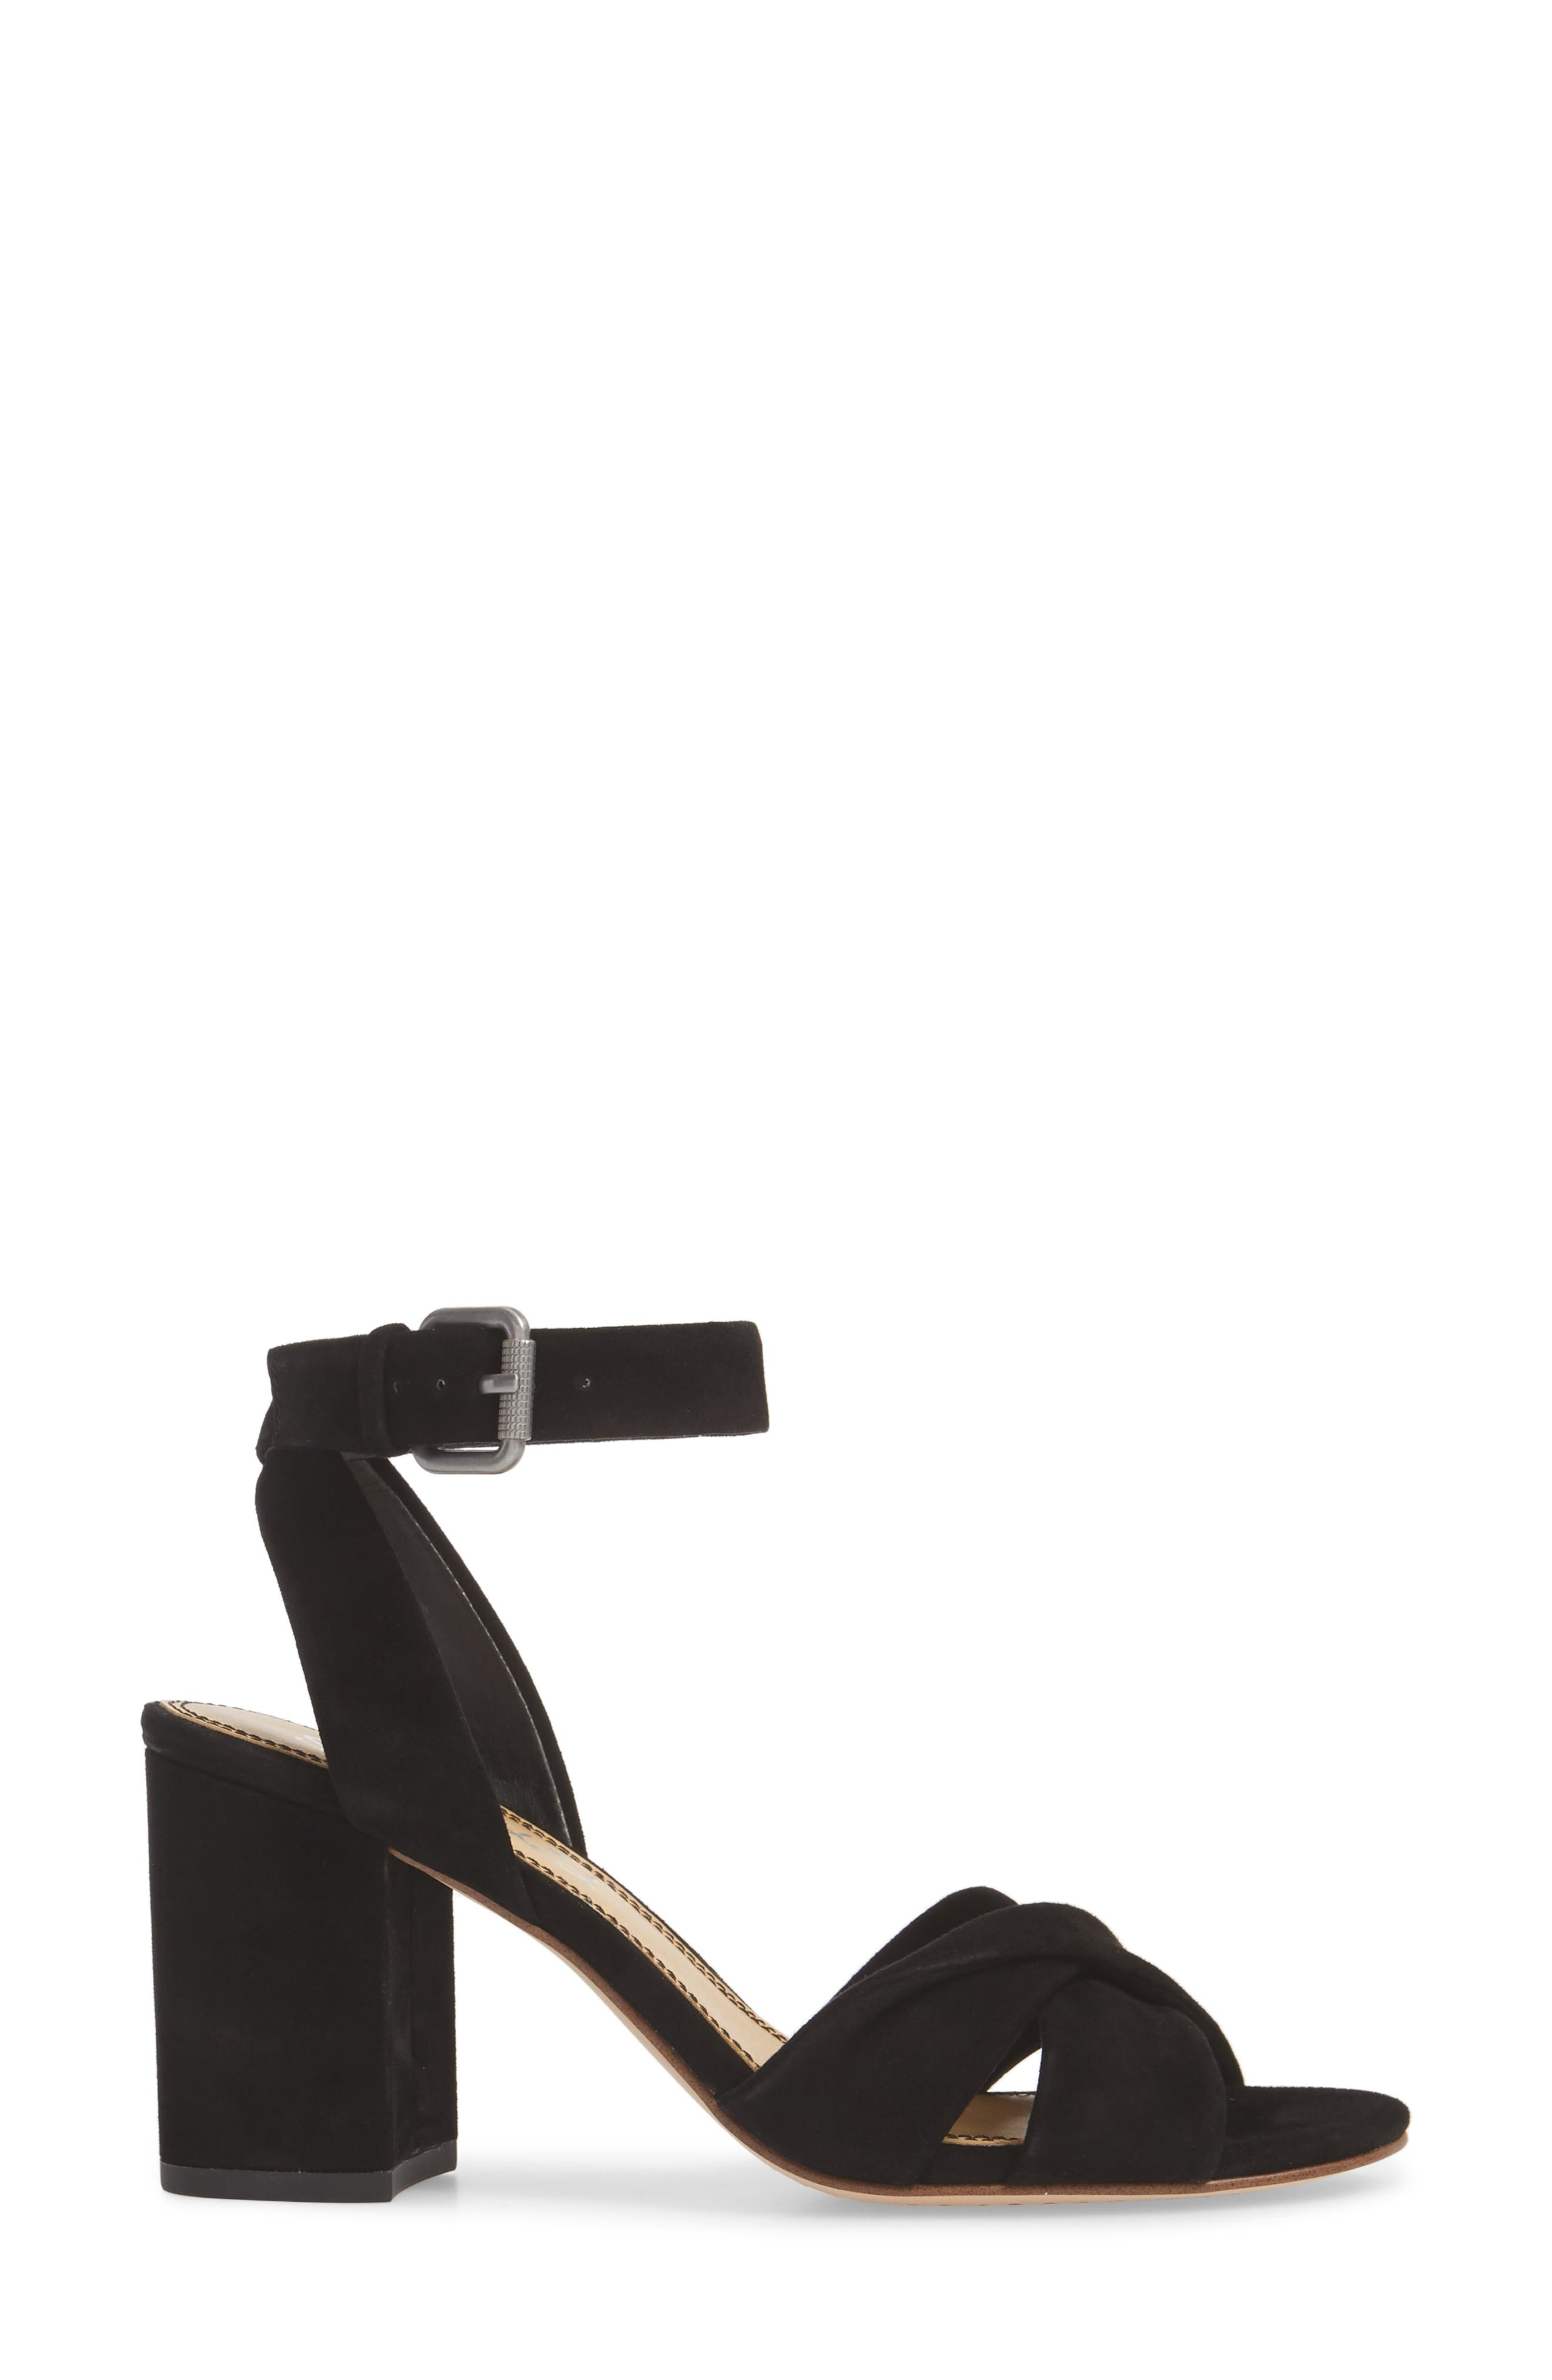 Fairy Block Heel Sandal,                             Alternate thumbnail 3, color,                             Black Suede